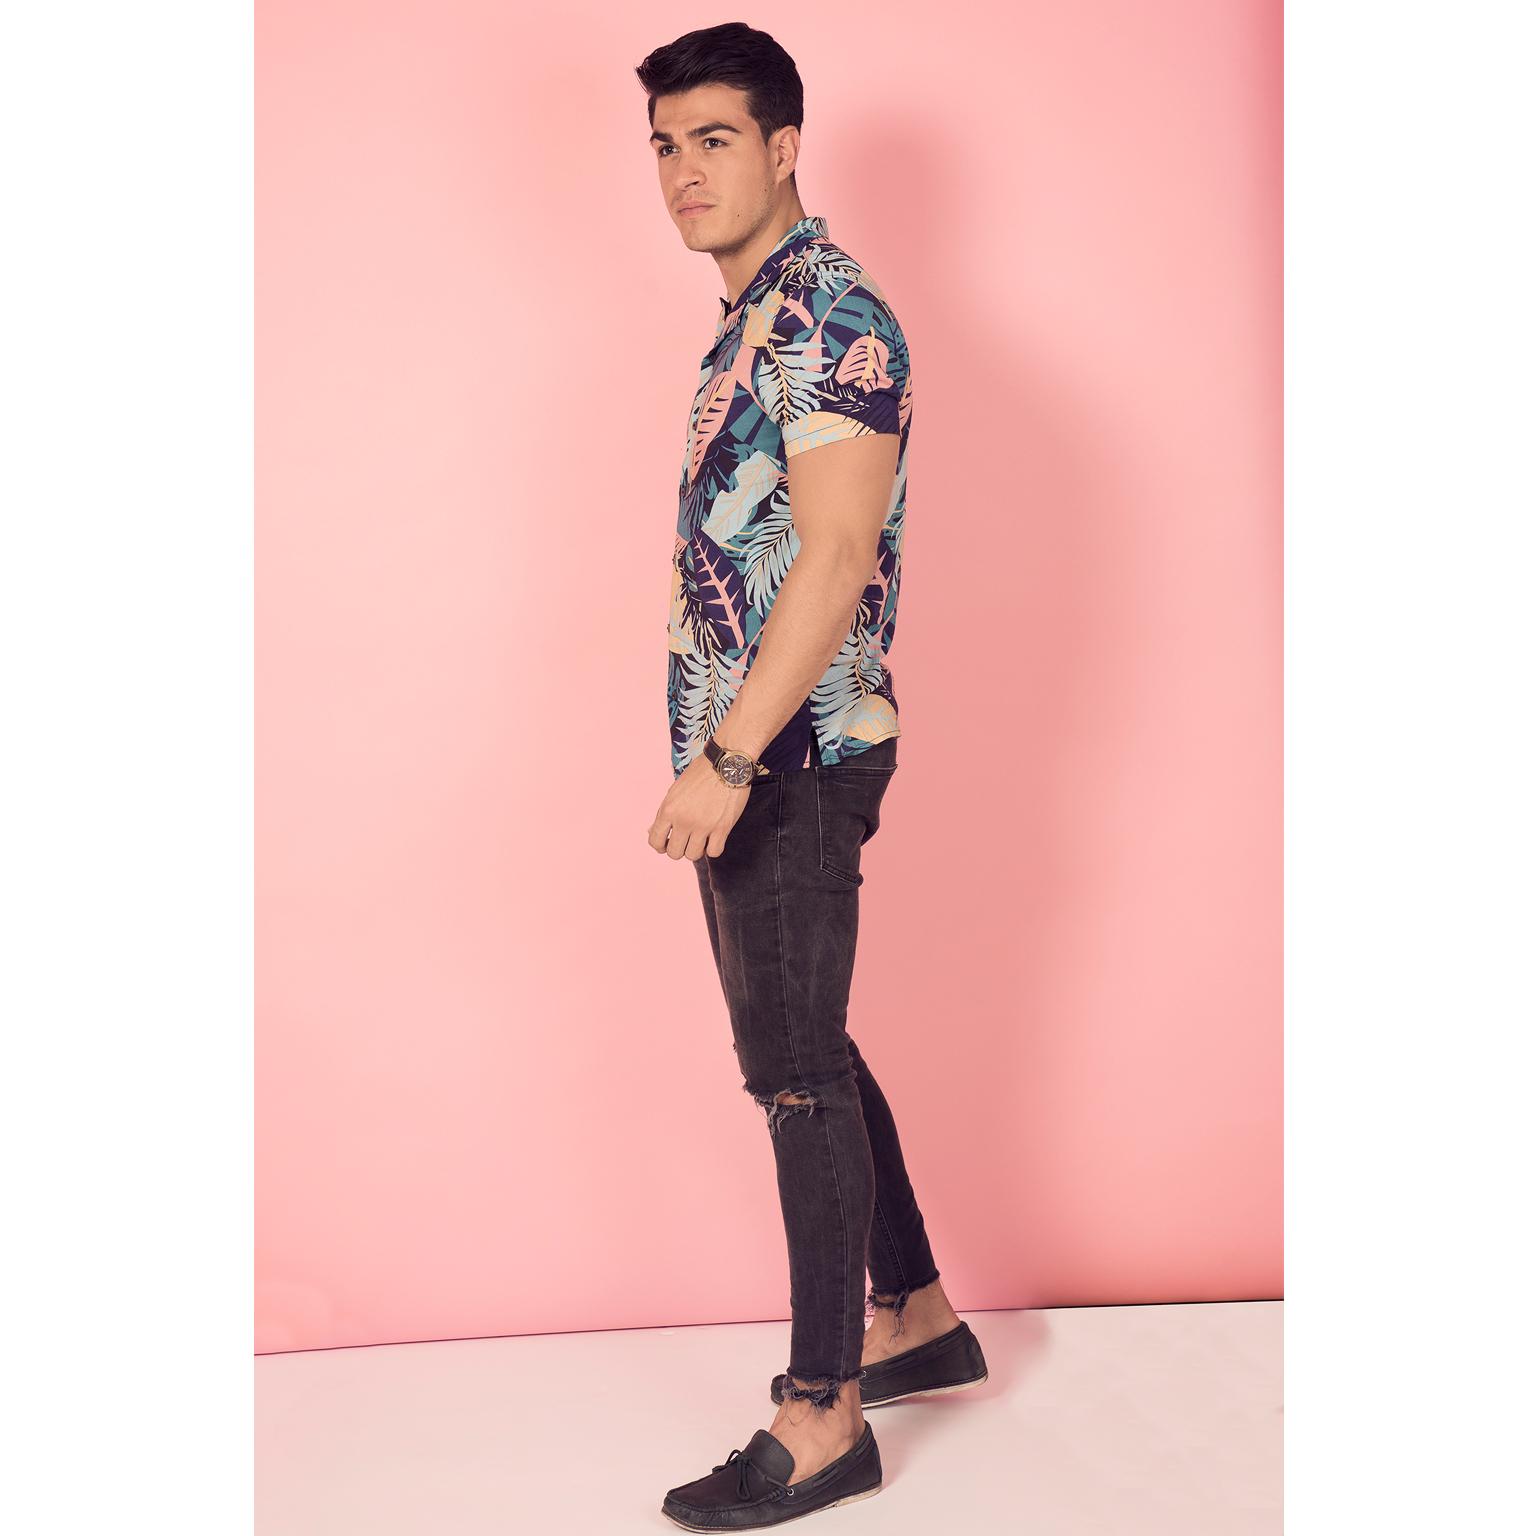 Toronto-Fitness-Model-Agency-Fashion-Lifestyle-Juan-Osorio